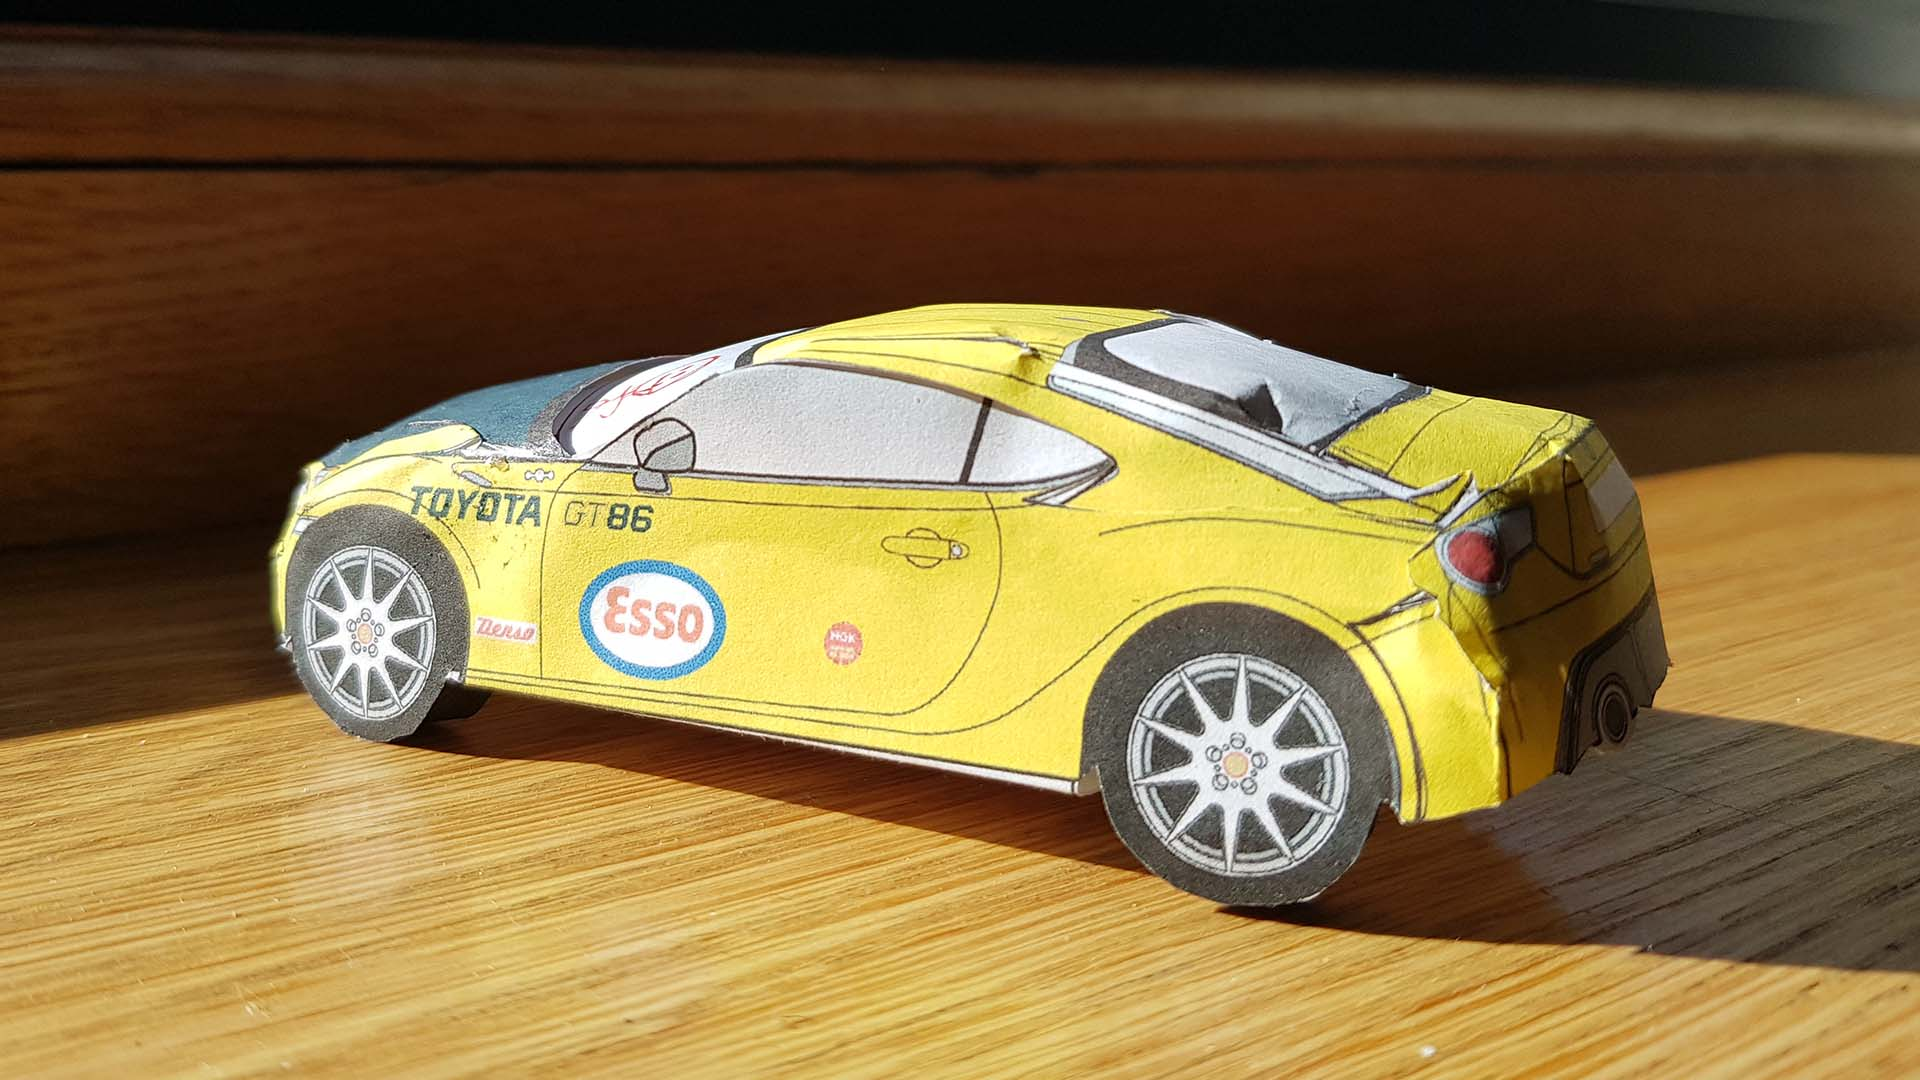 Toyota GT86 paper model